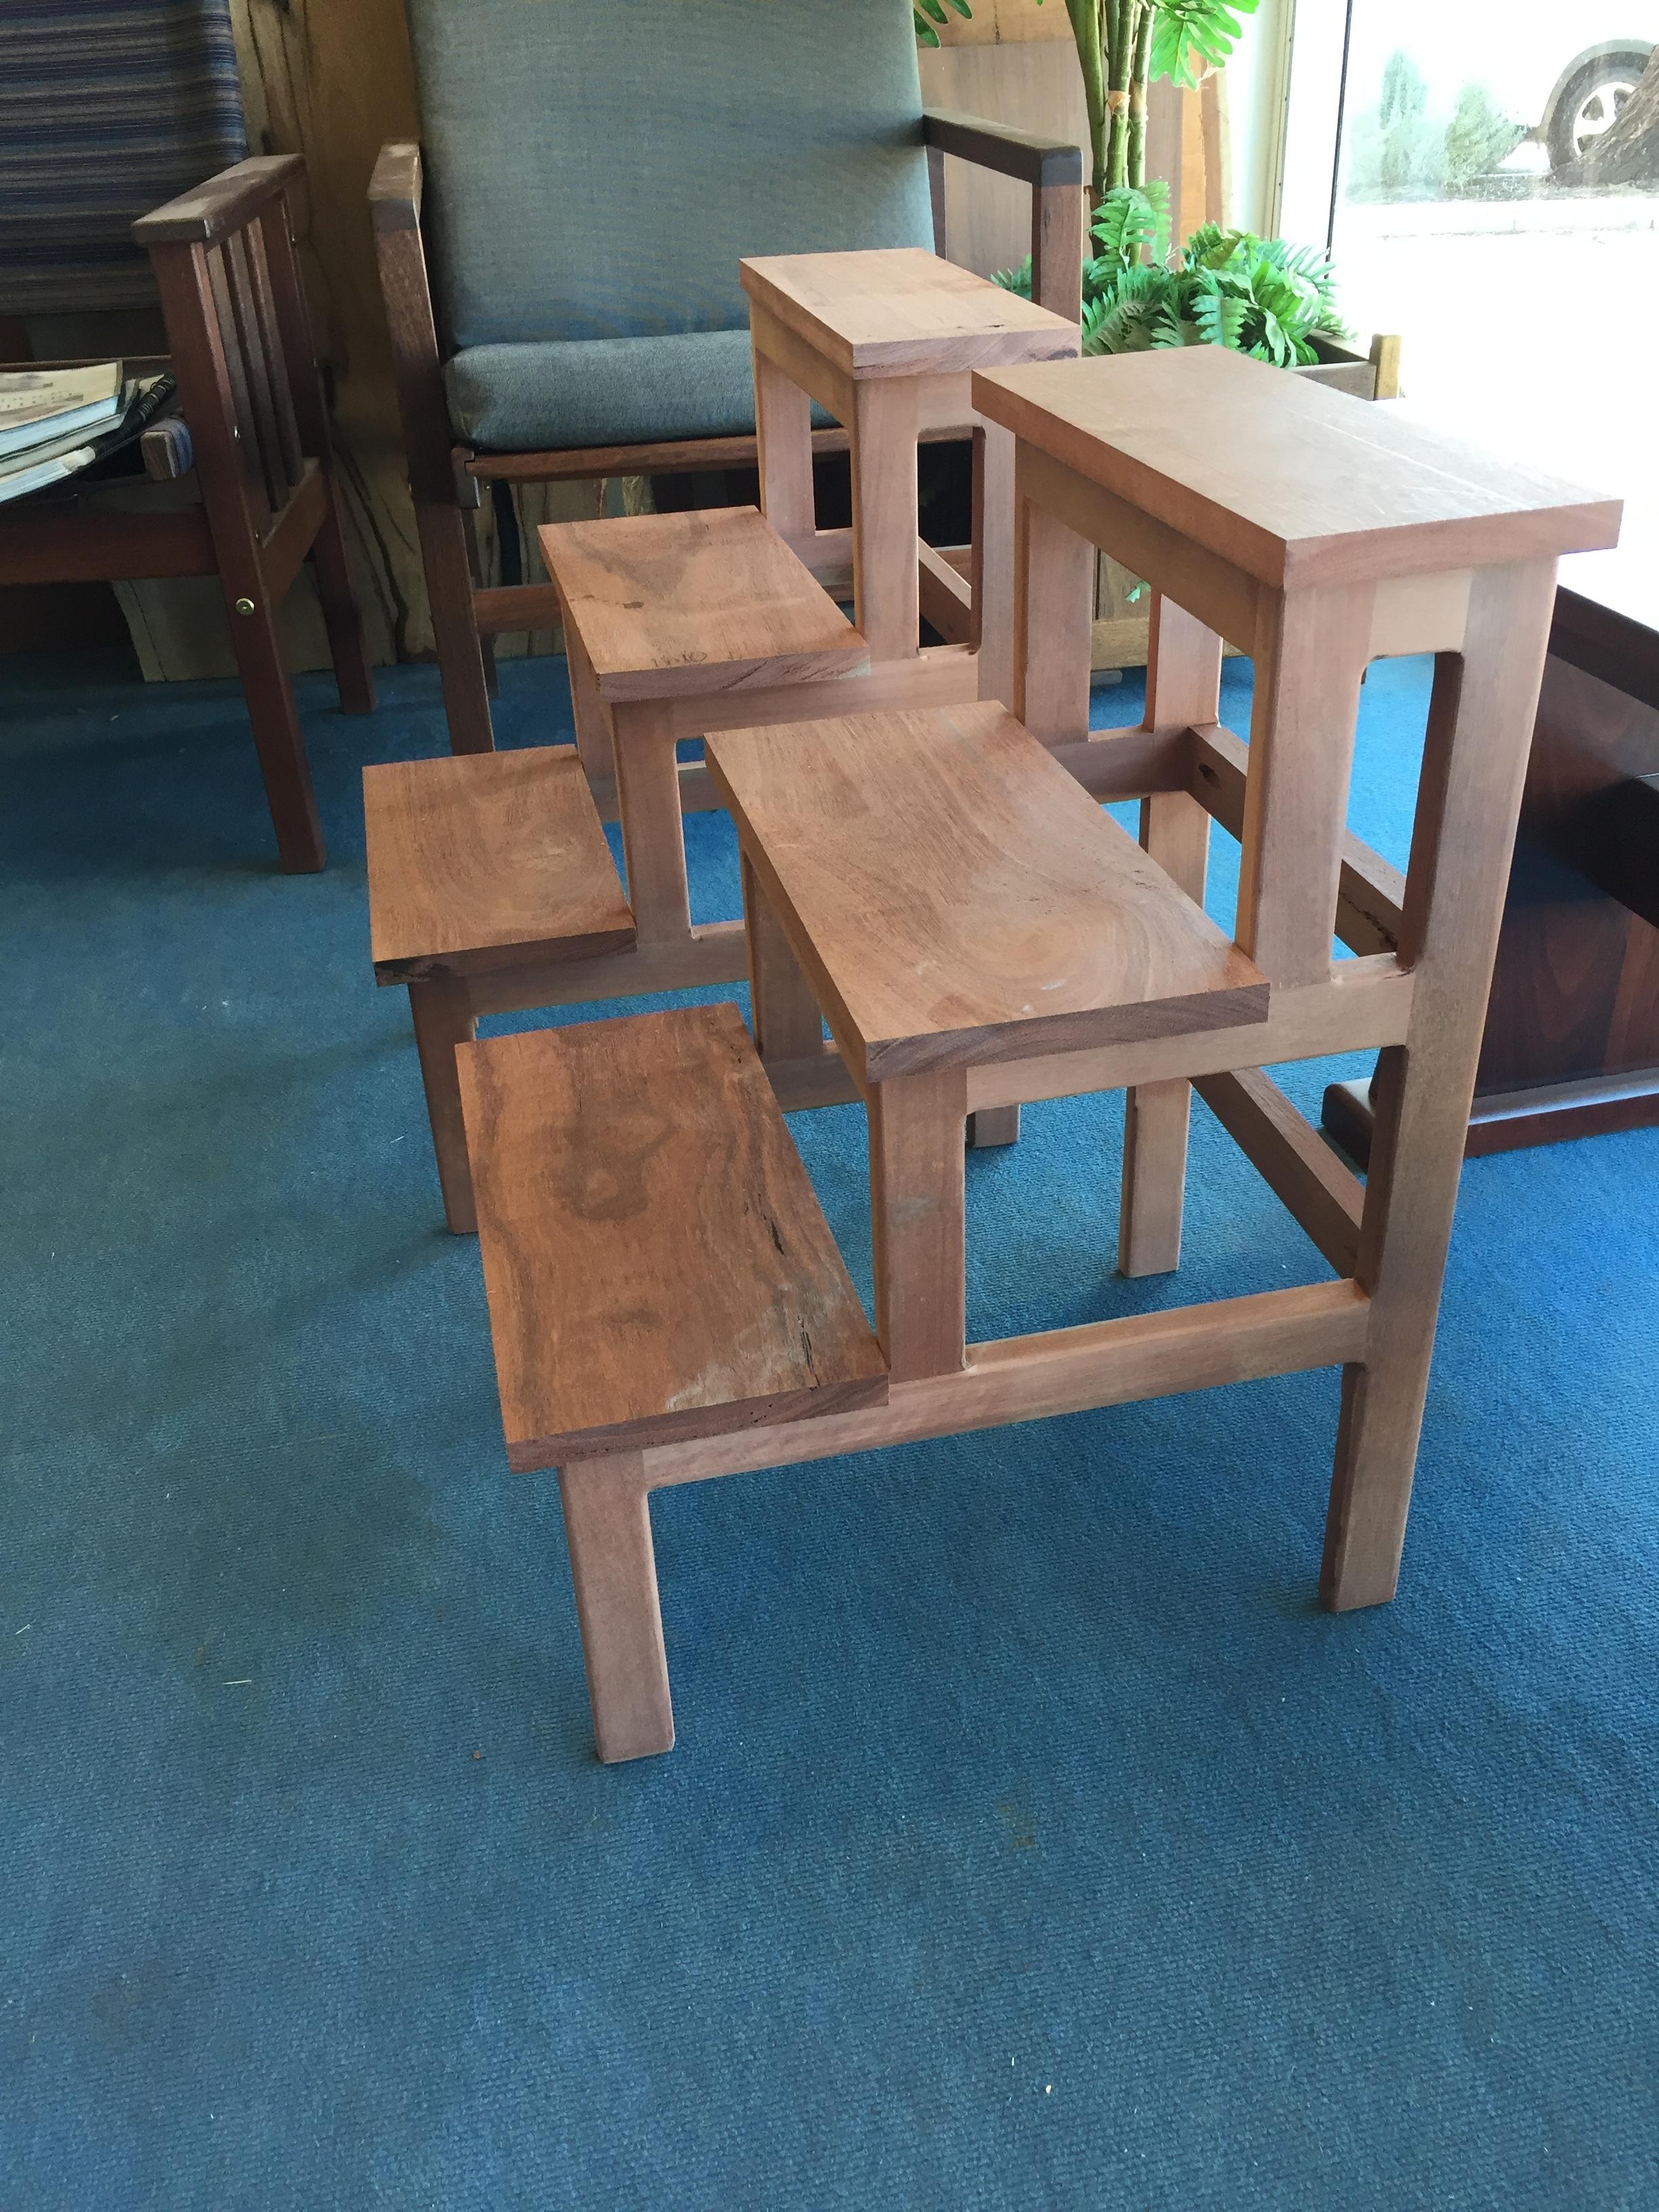 Jarrah Step stools in progress